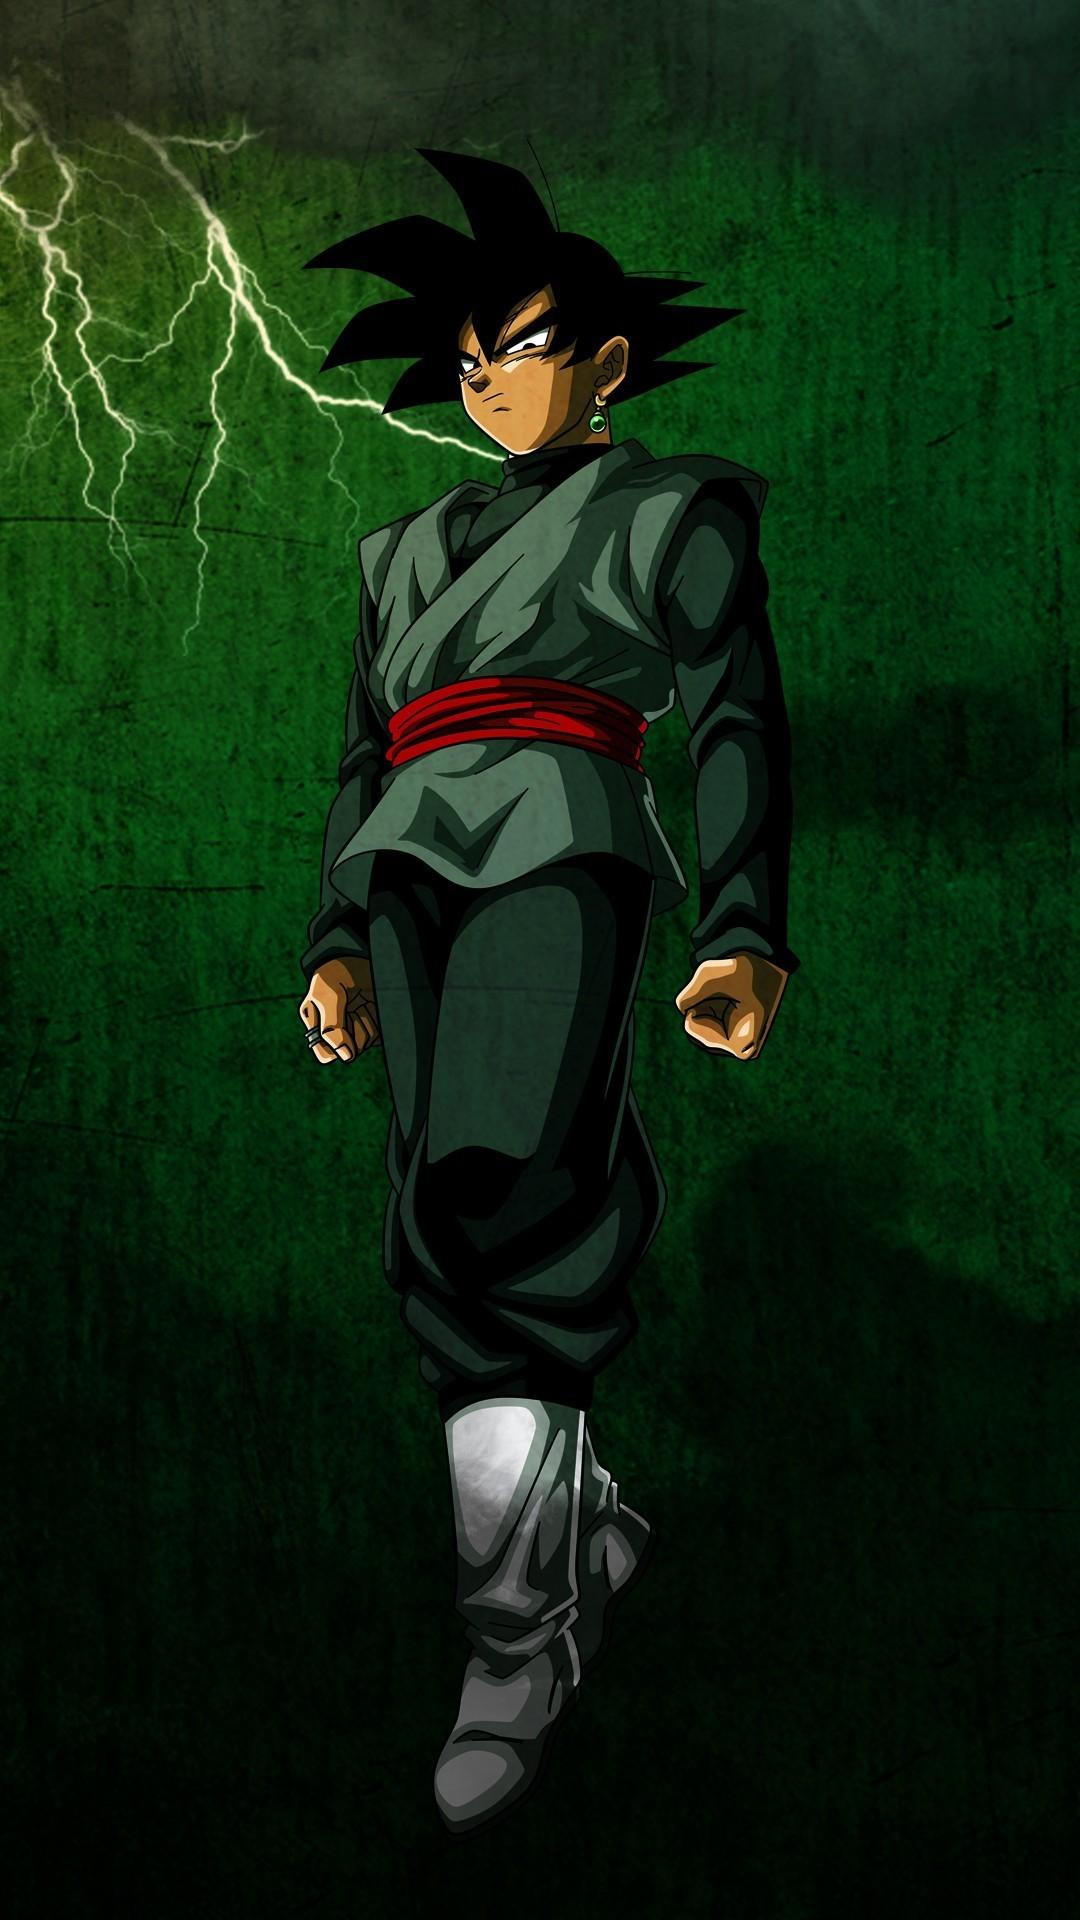 Free Download Iphone 7 Wallpaper Black Goku 2019 3d Iphone